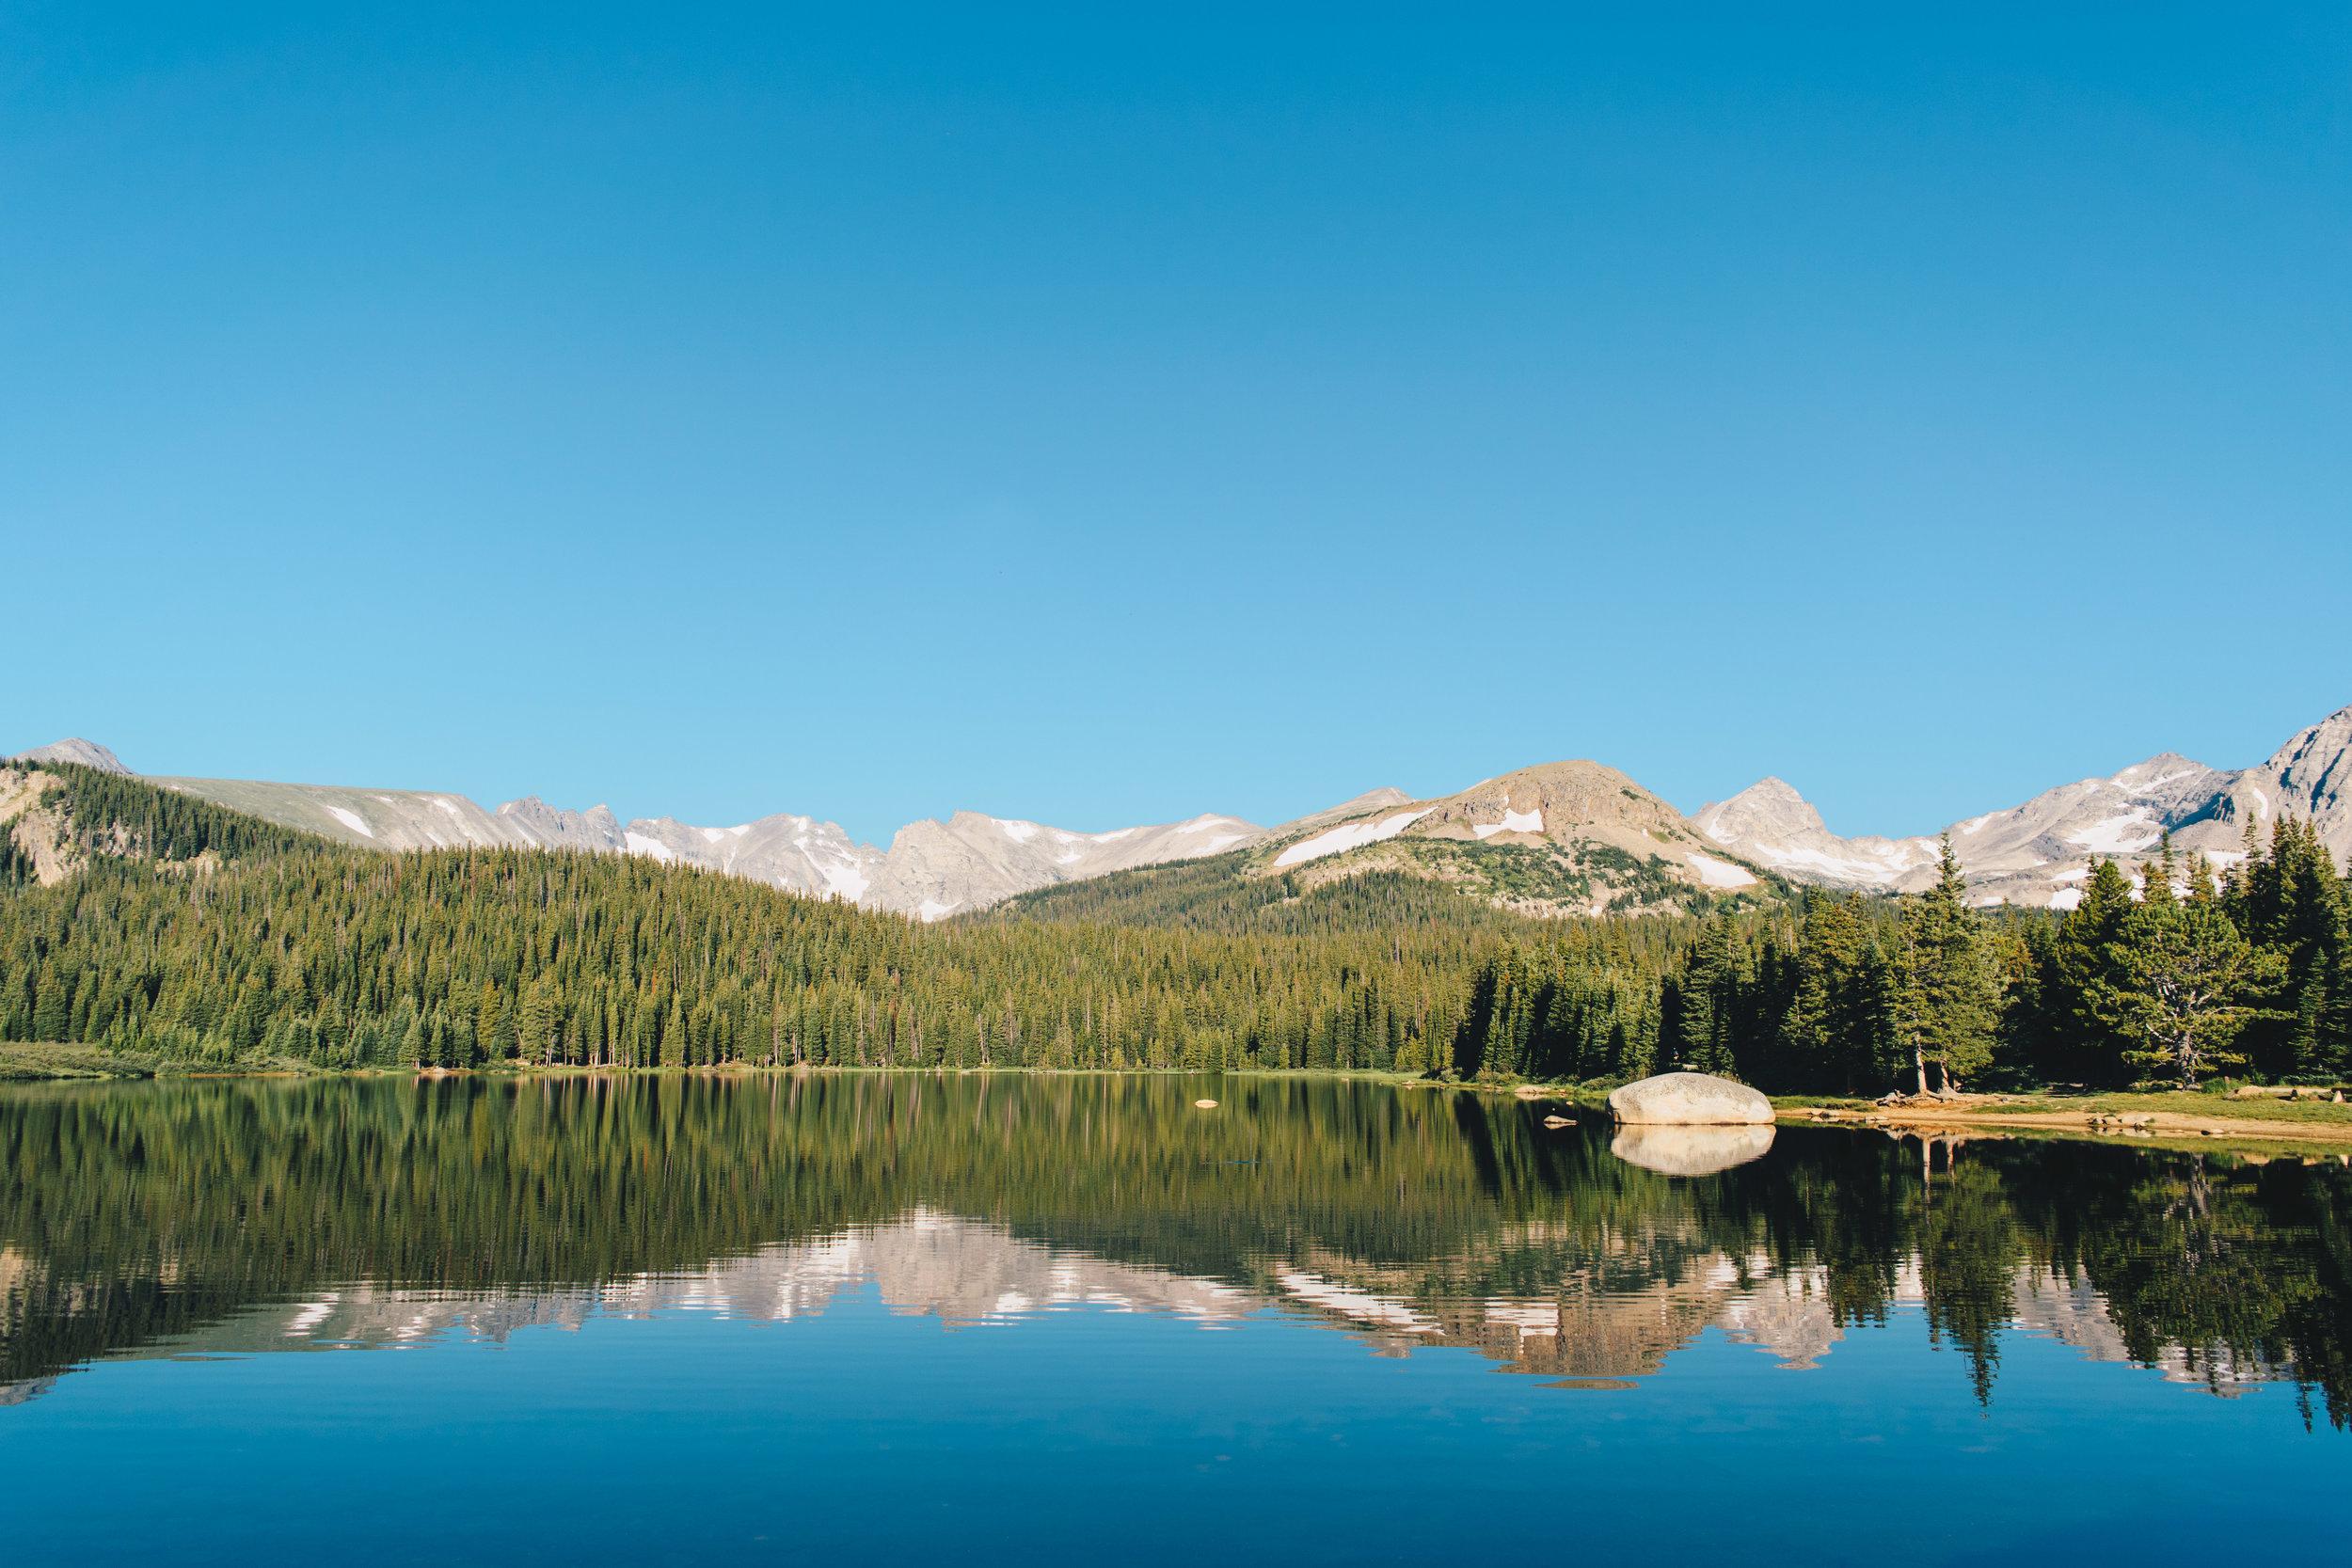 Braindard Lake